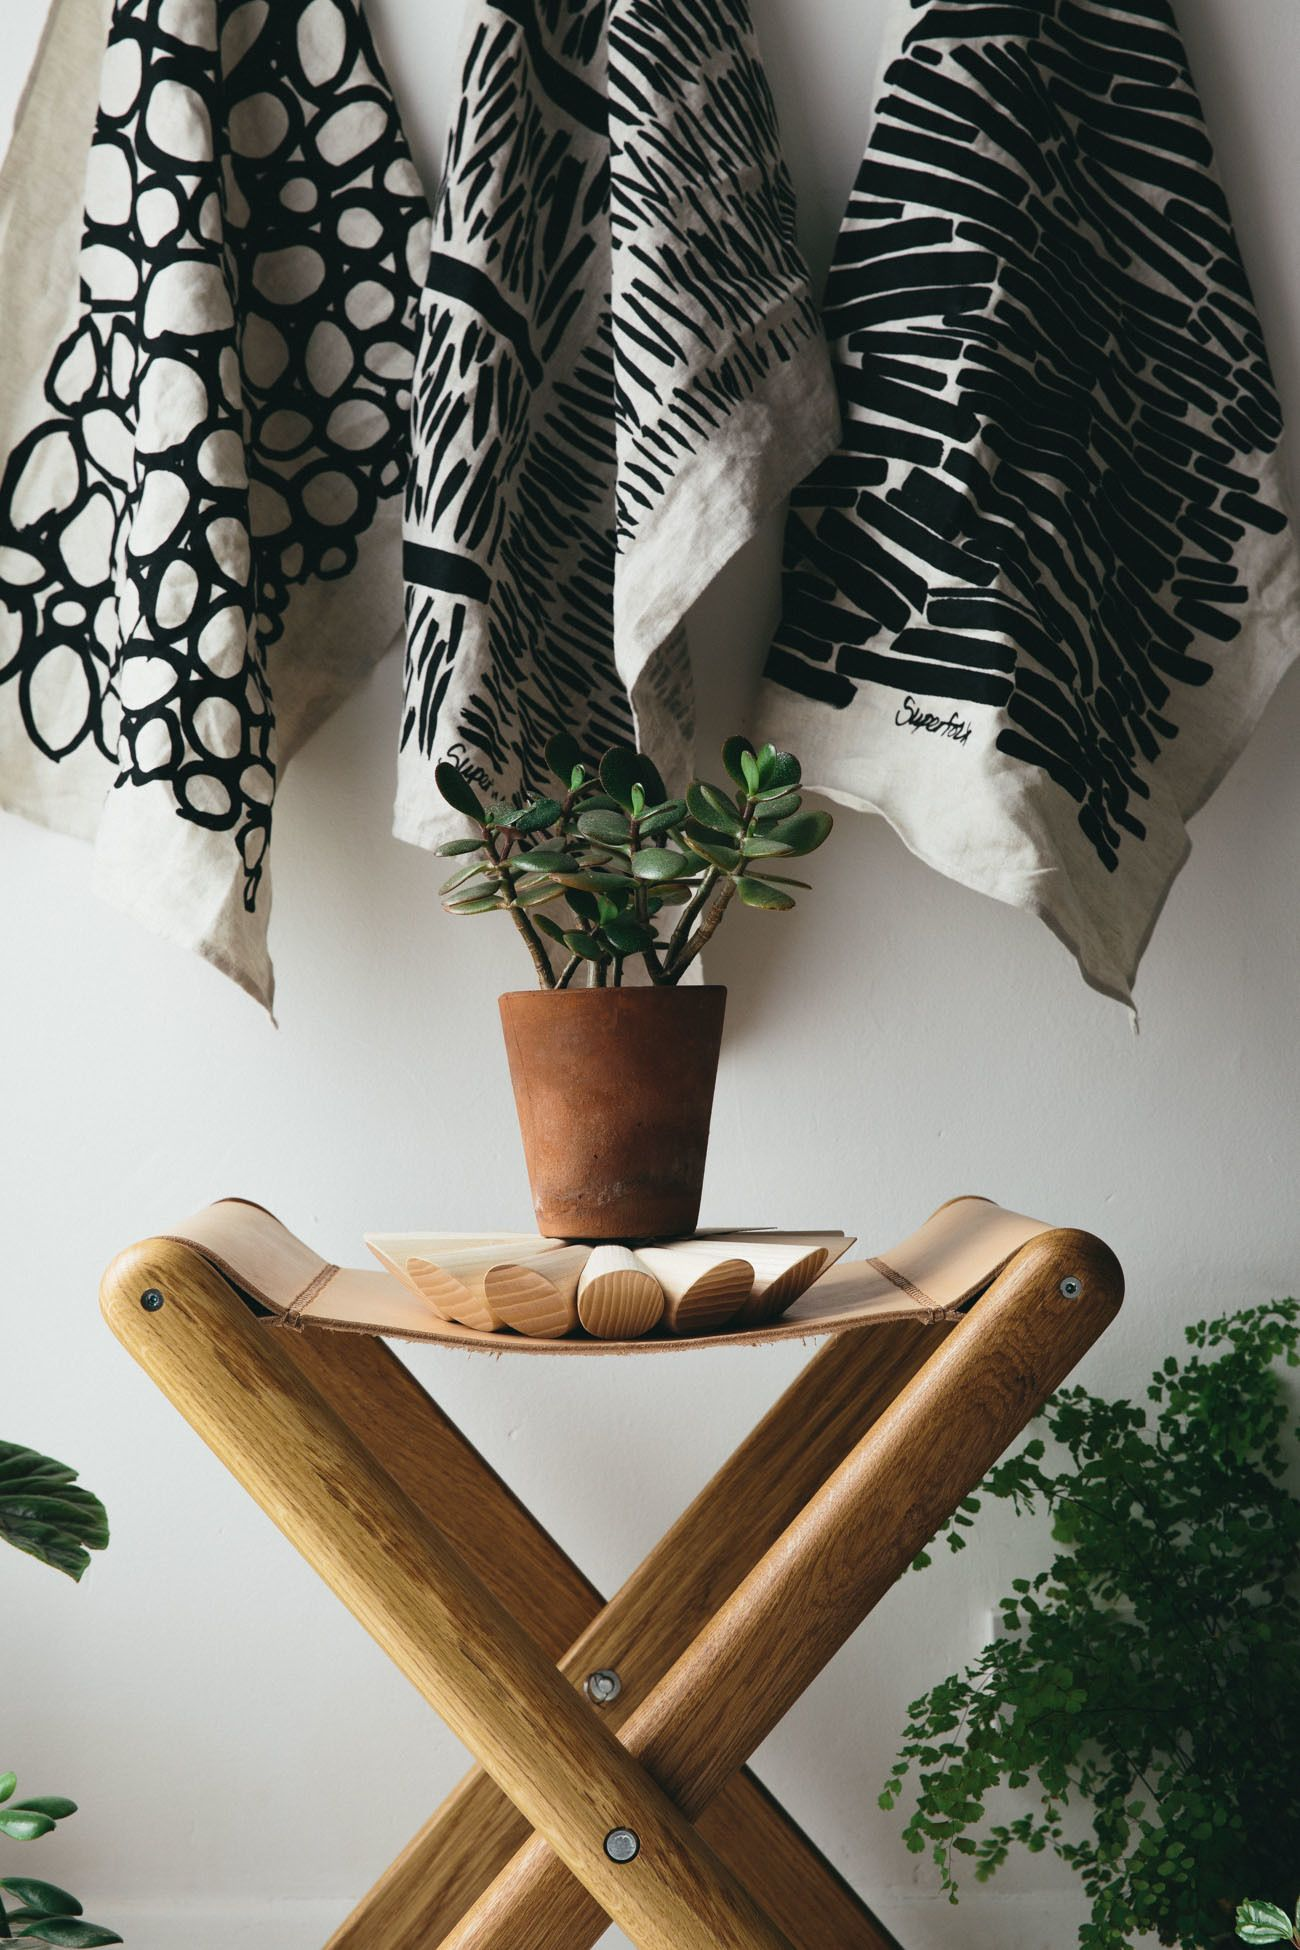 Terracotta Bad oak and leather folding stool terracotta pots and terracotta